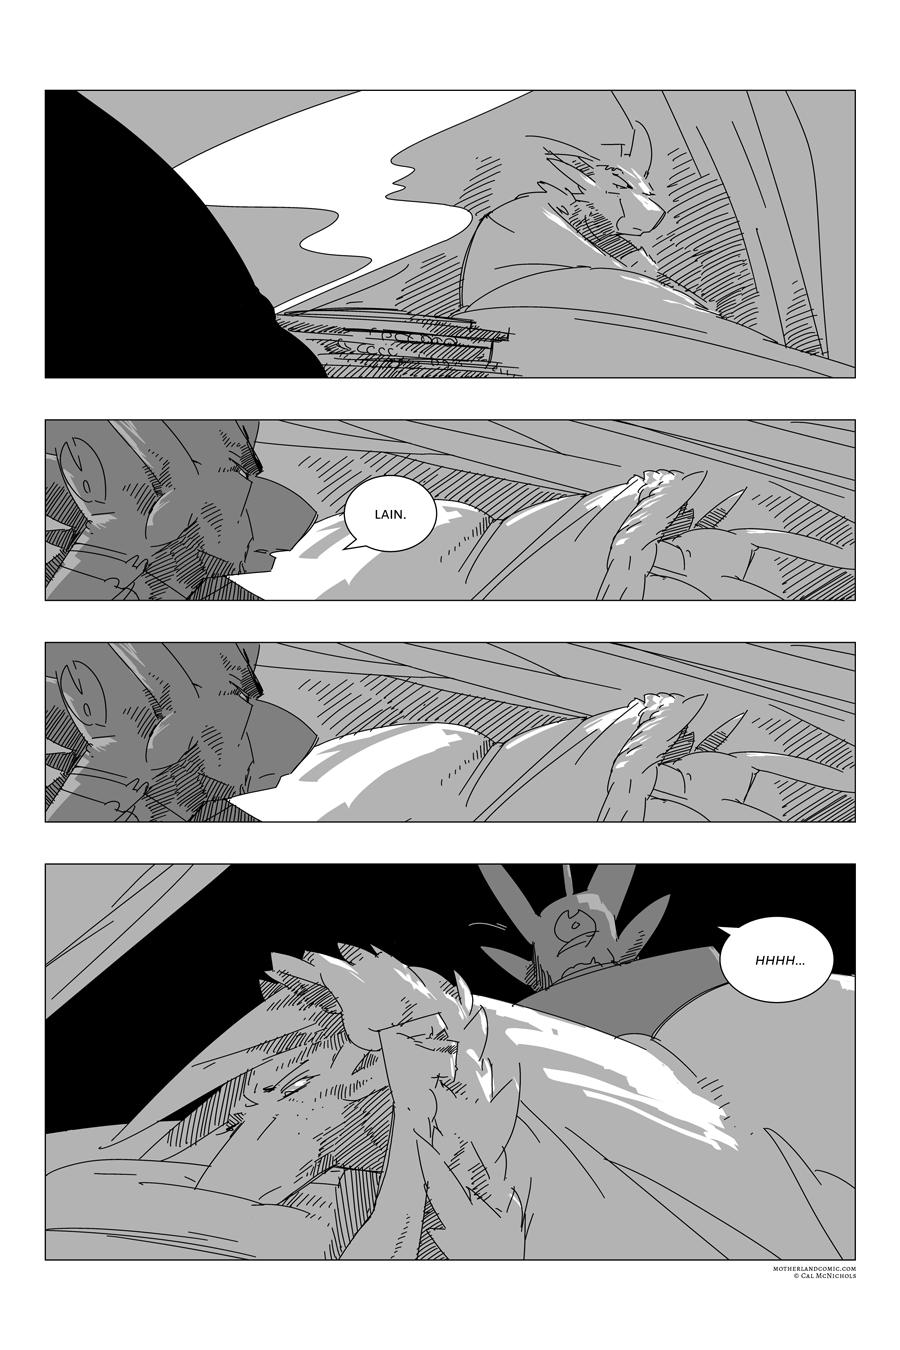 pg 81